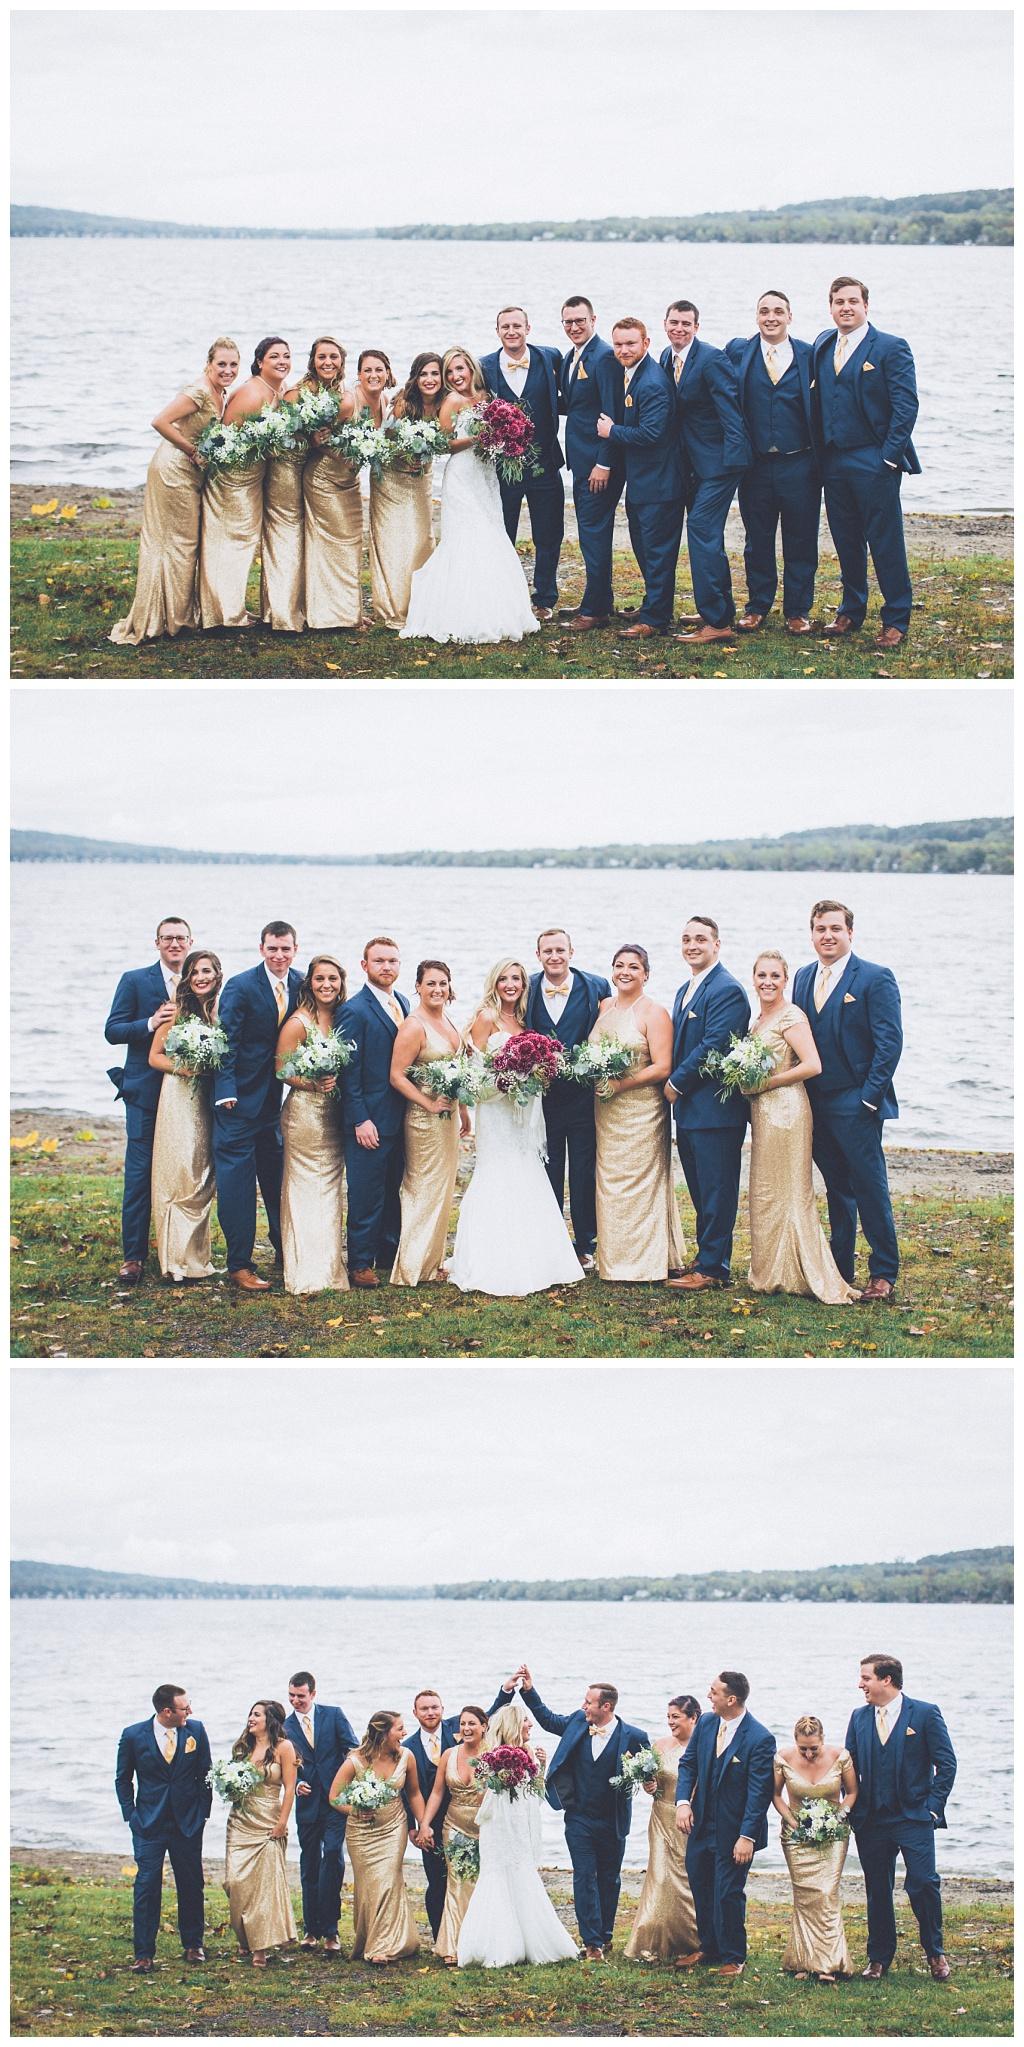 finger-lakes-wedding-photography_0043.jpg